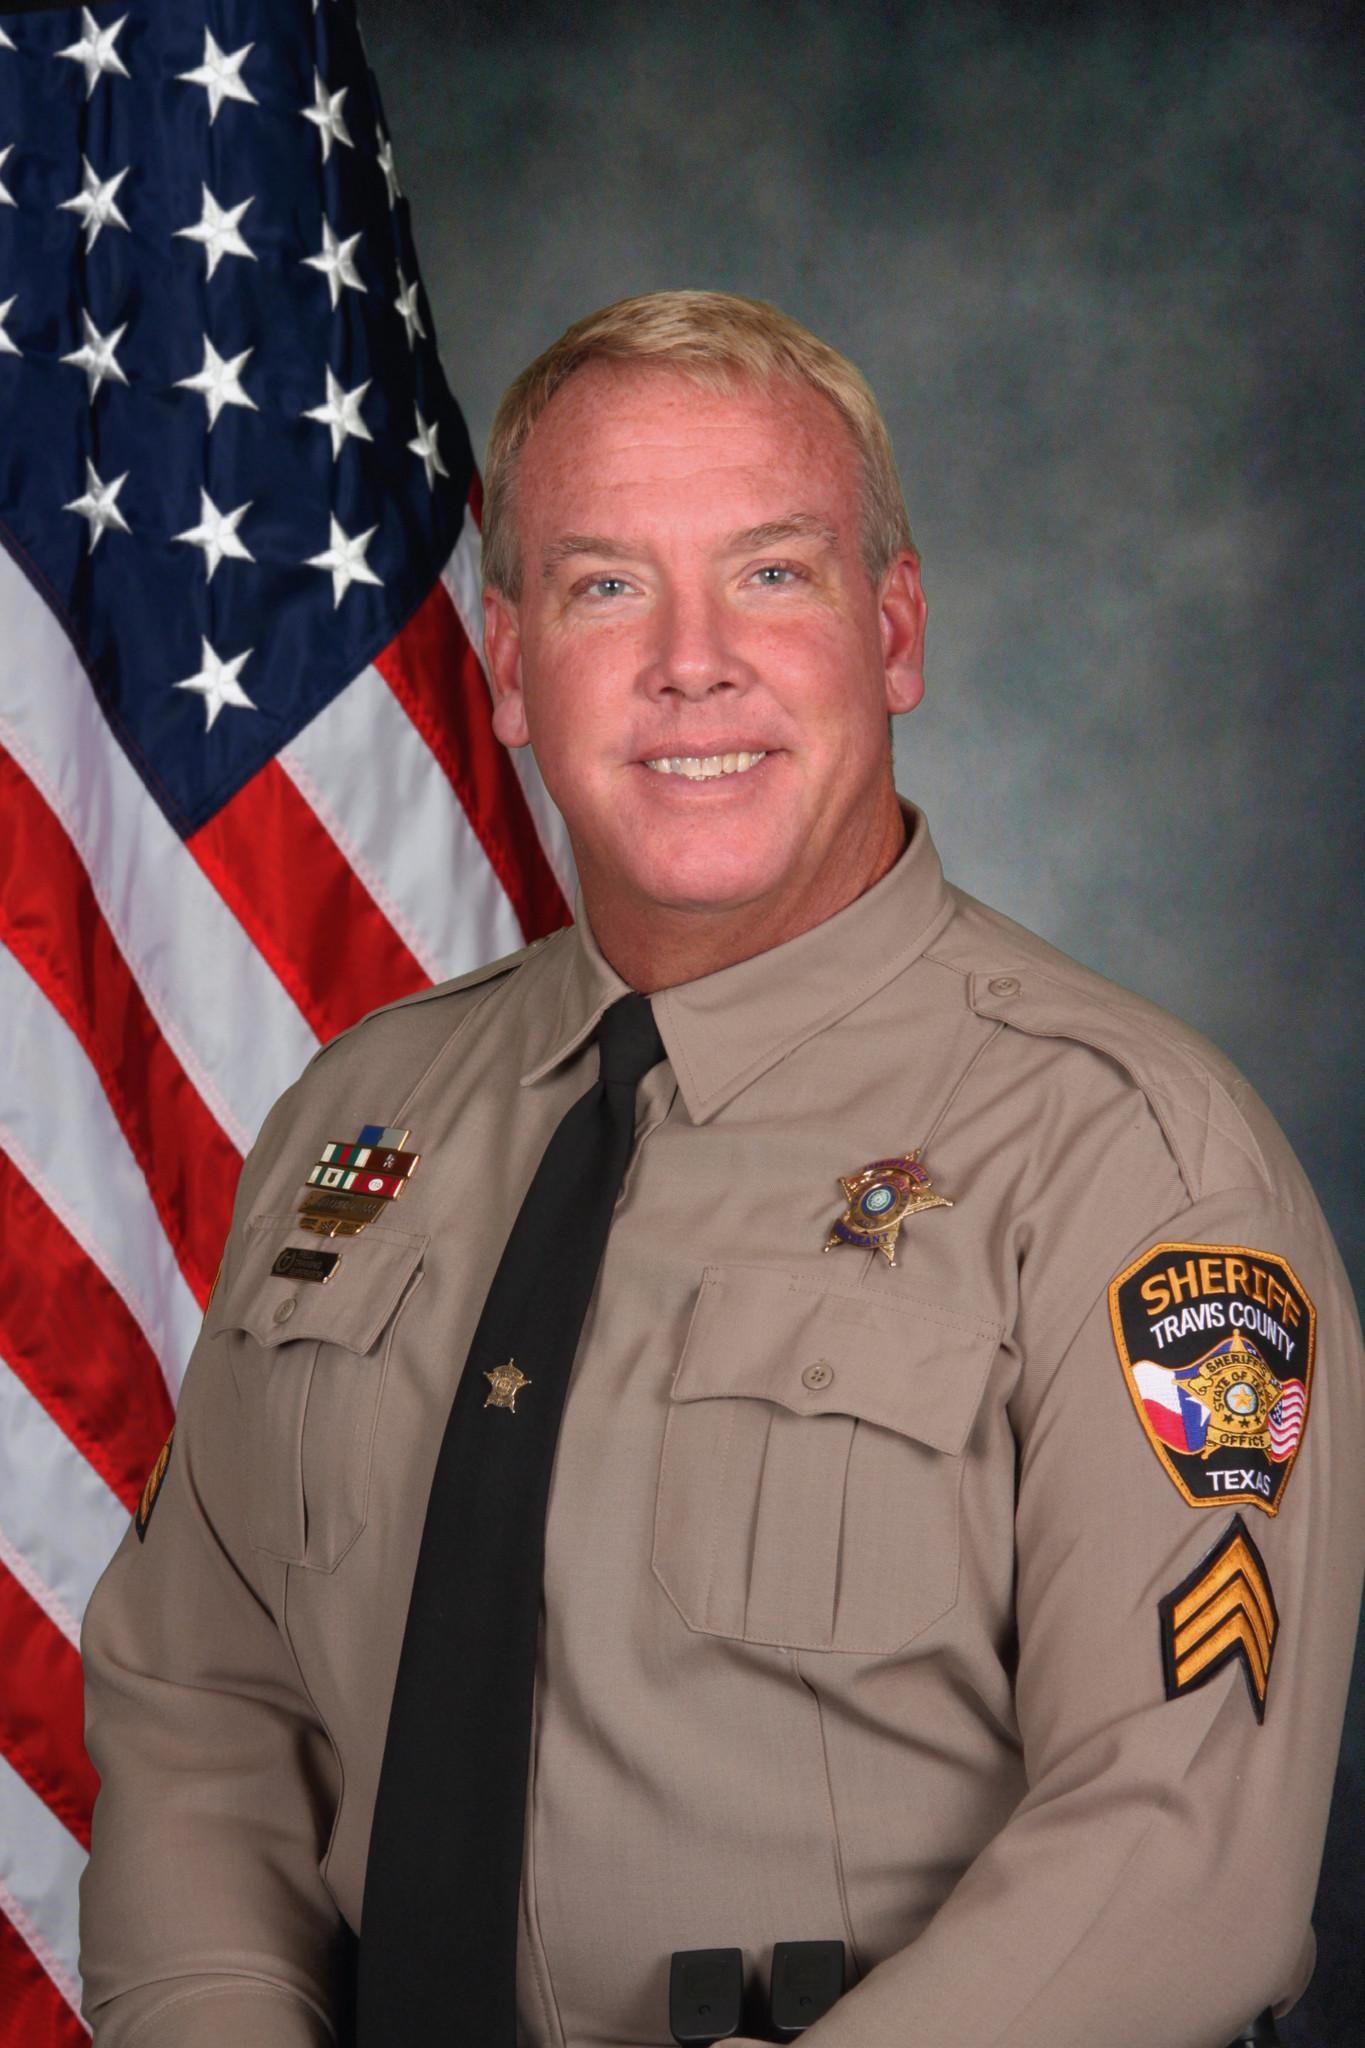 Texas sheriff's deputy killed in apparent burglary attempt ...